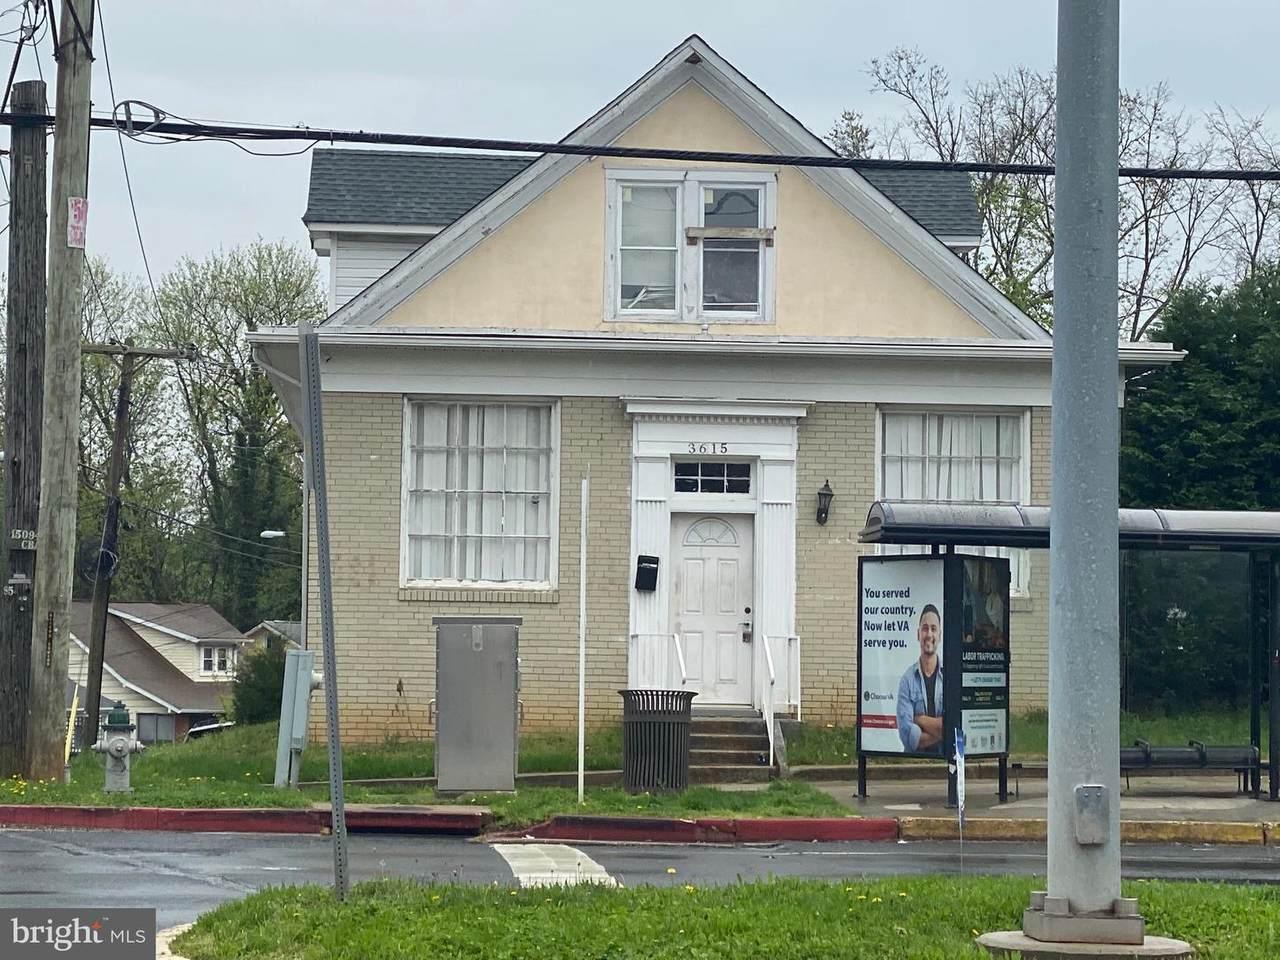 3615 Rhode Island Avenue - Photo 1